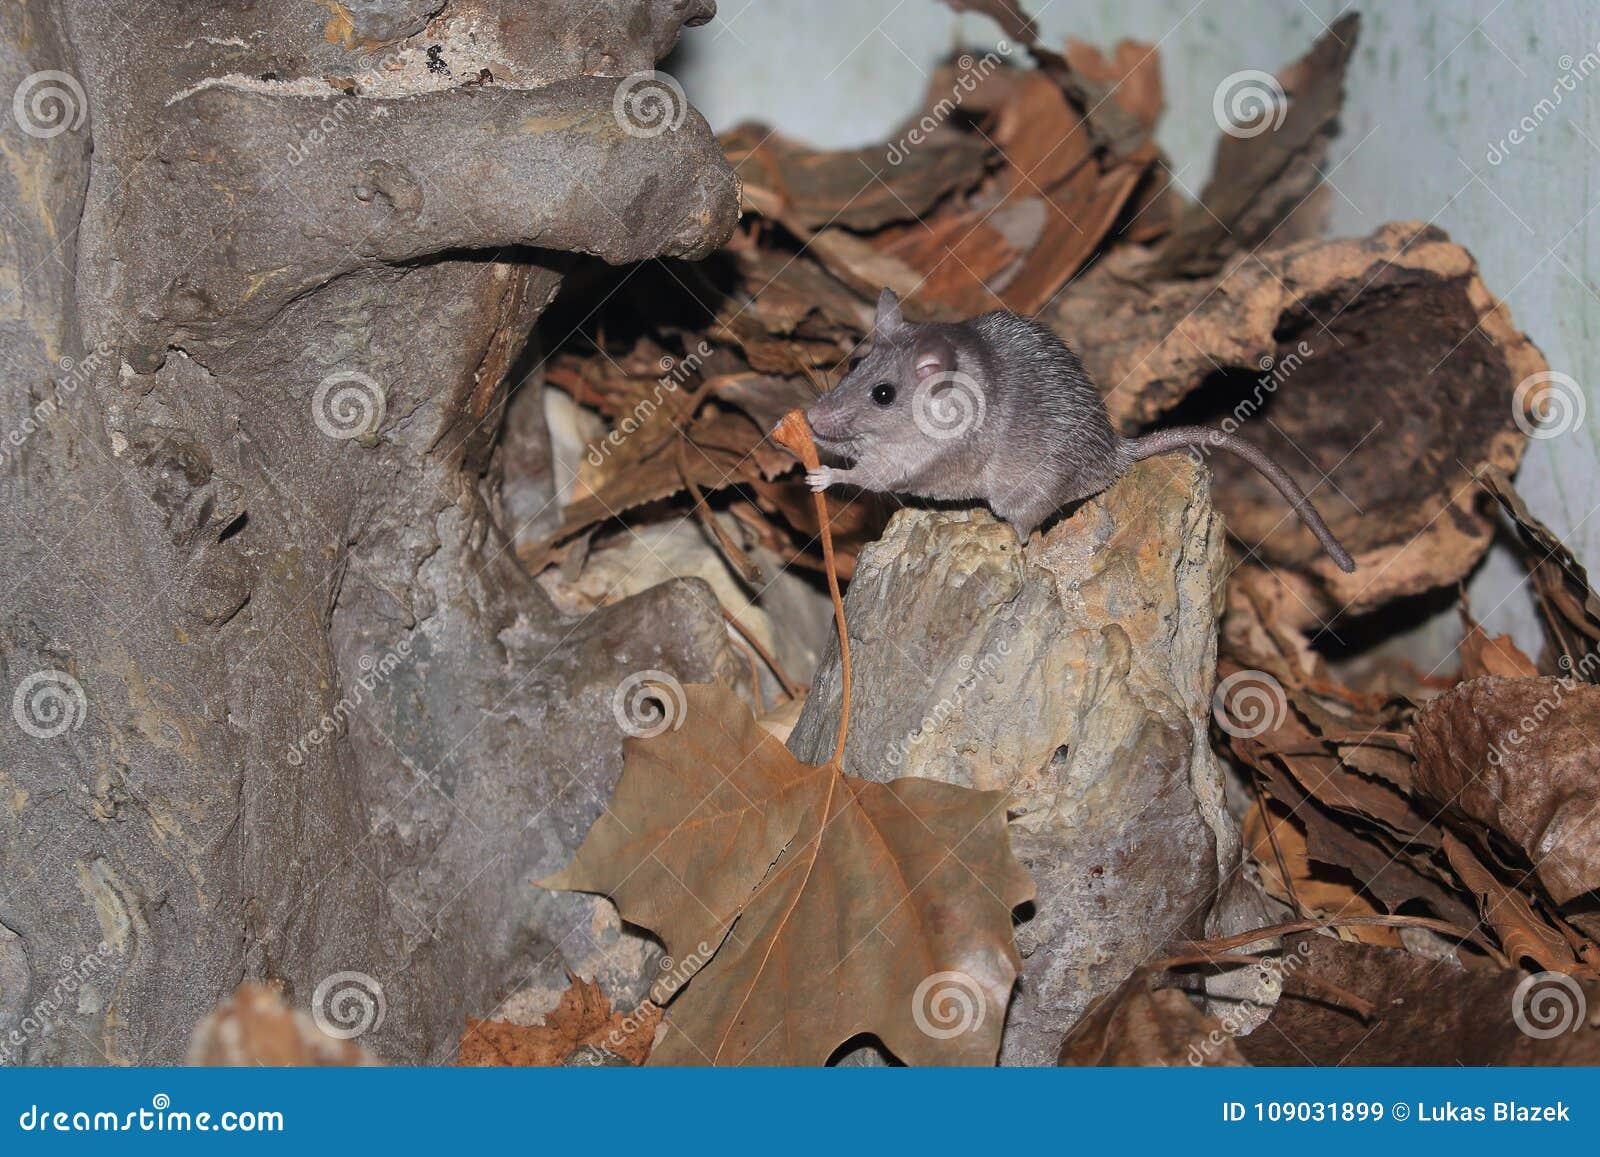 Stachelige Maus Tibesti